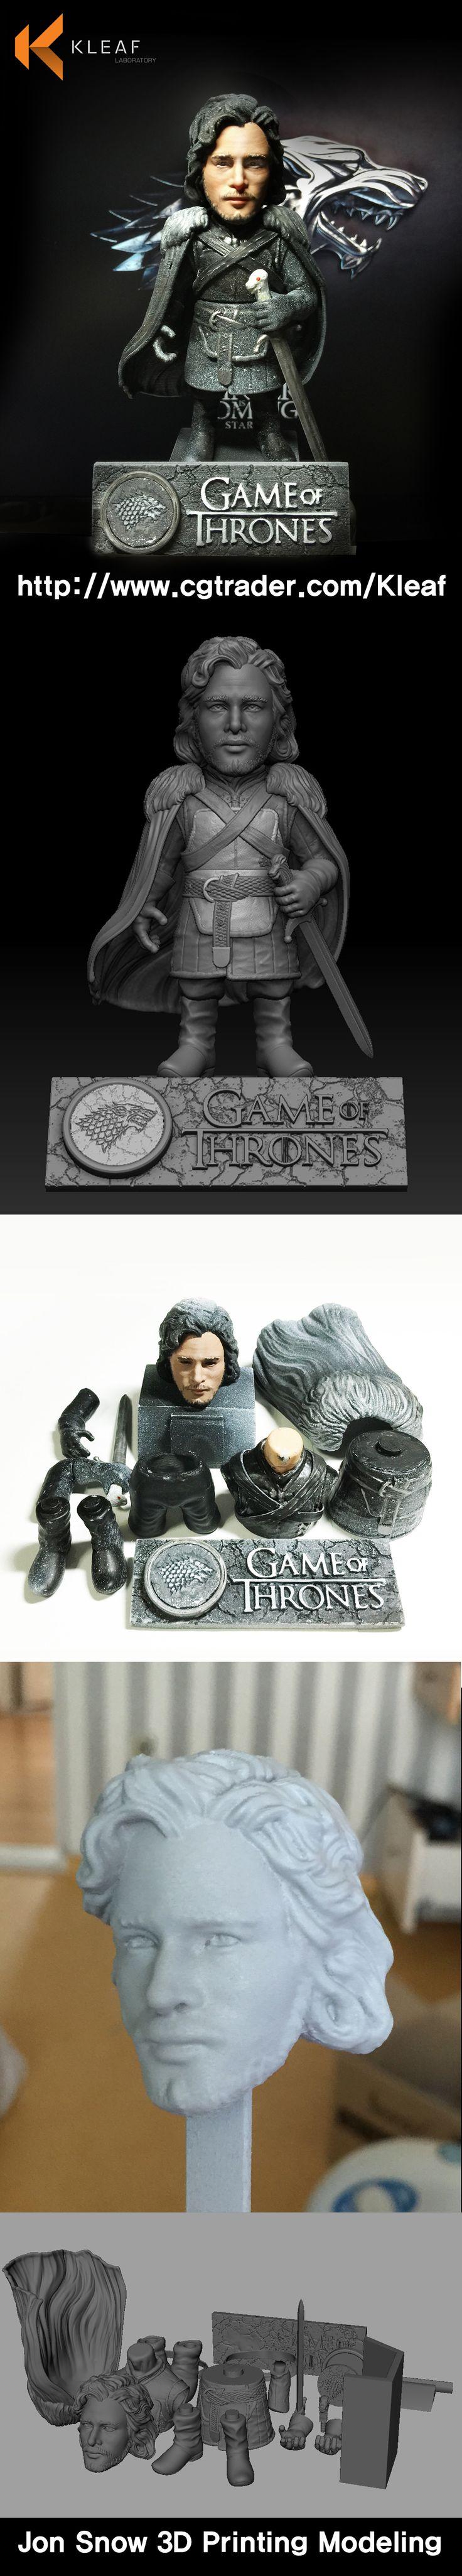 Game of Thrones - Jon Snow 3D Printing Modeling